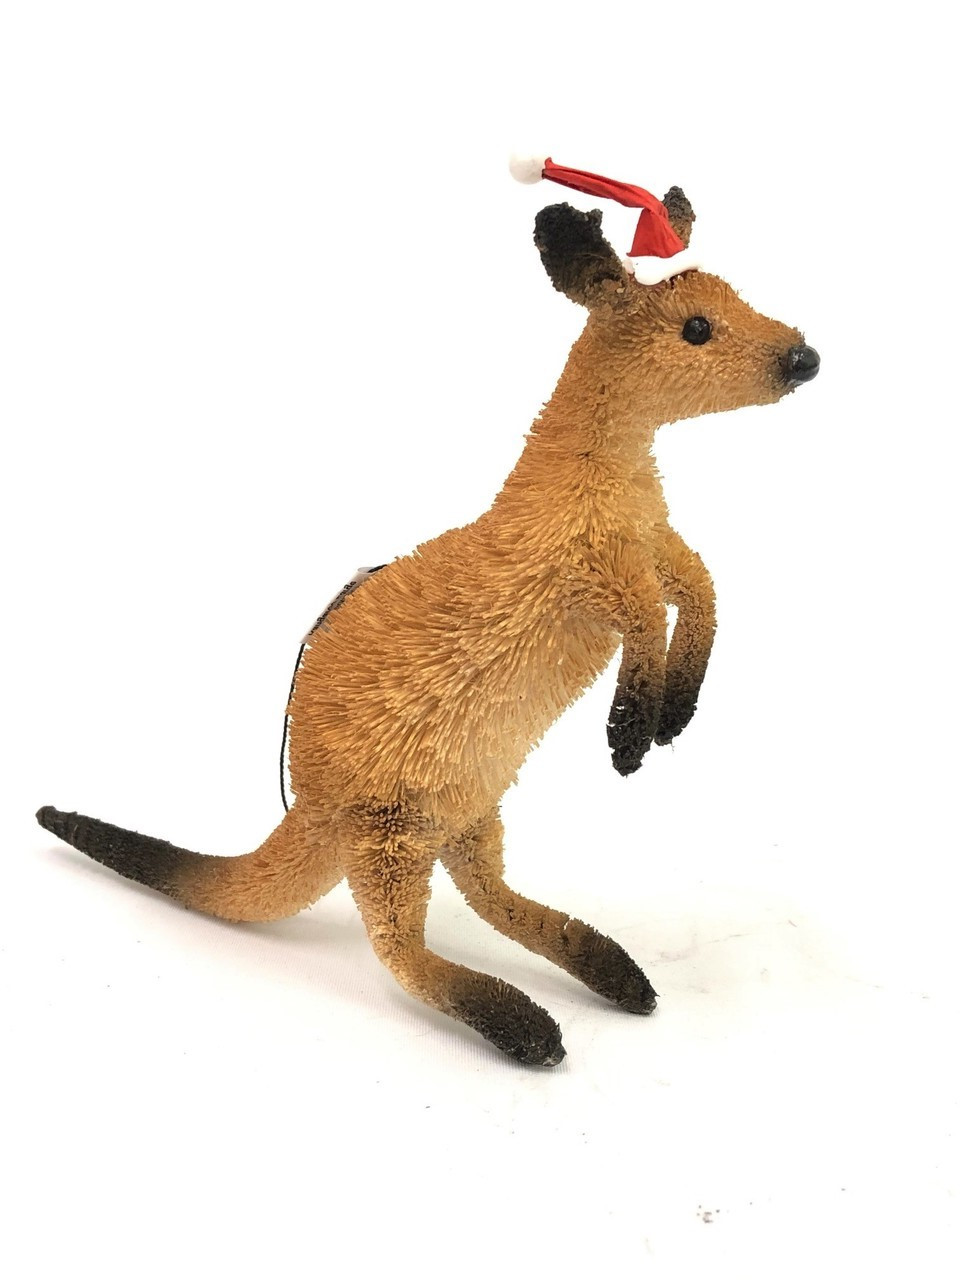 Large Red Kangaroo Standing / Hanging Christmas ornament - Bristlebrush - 15cm